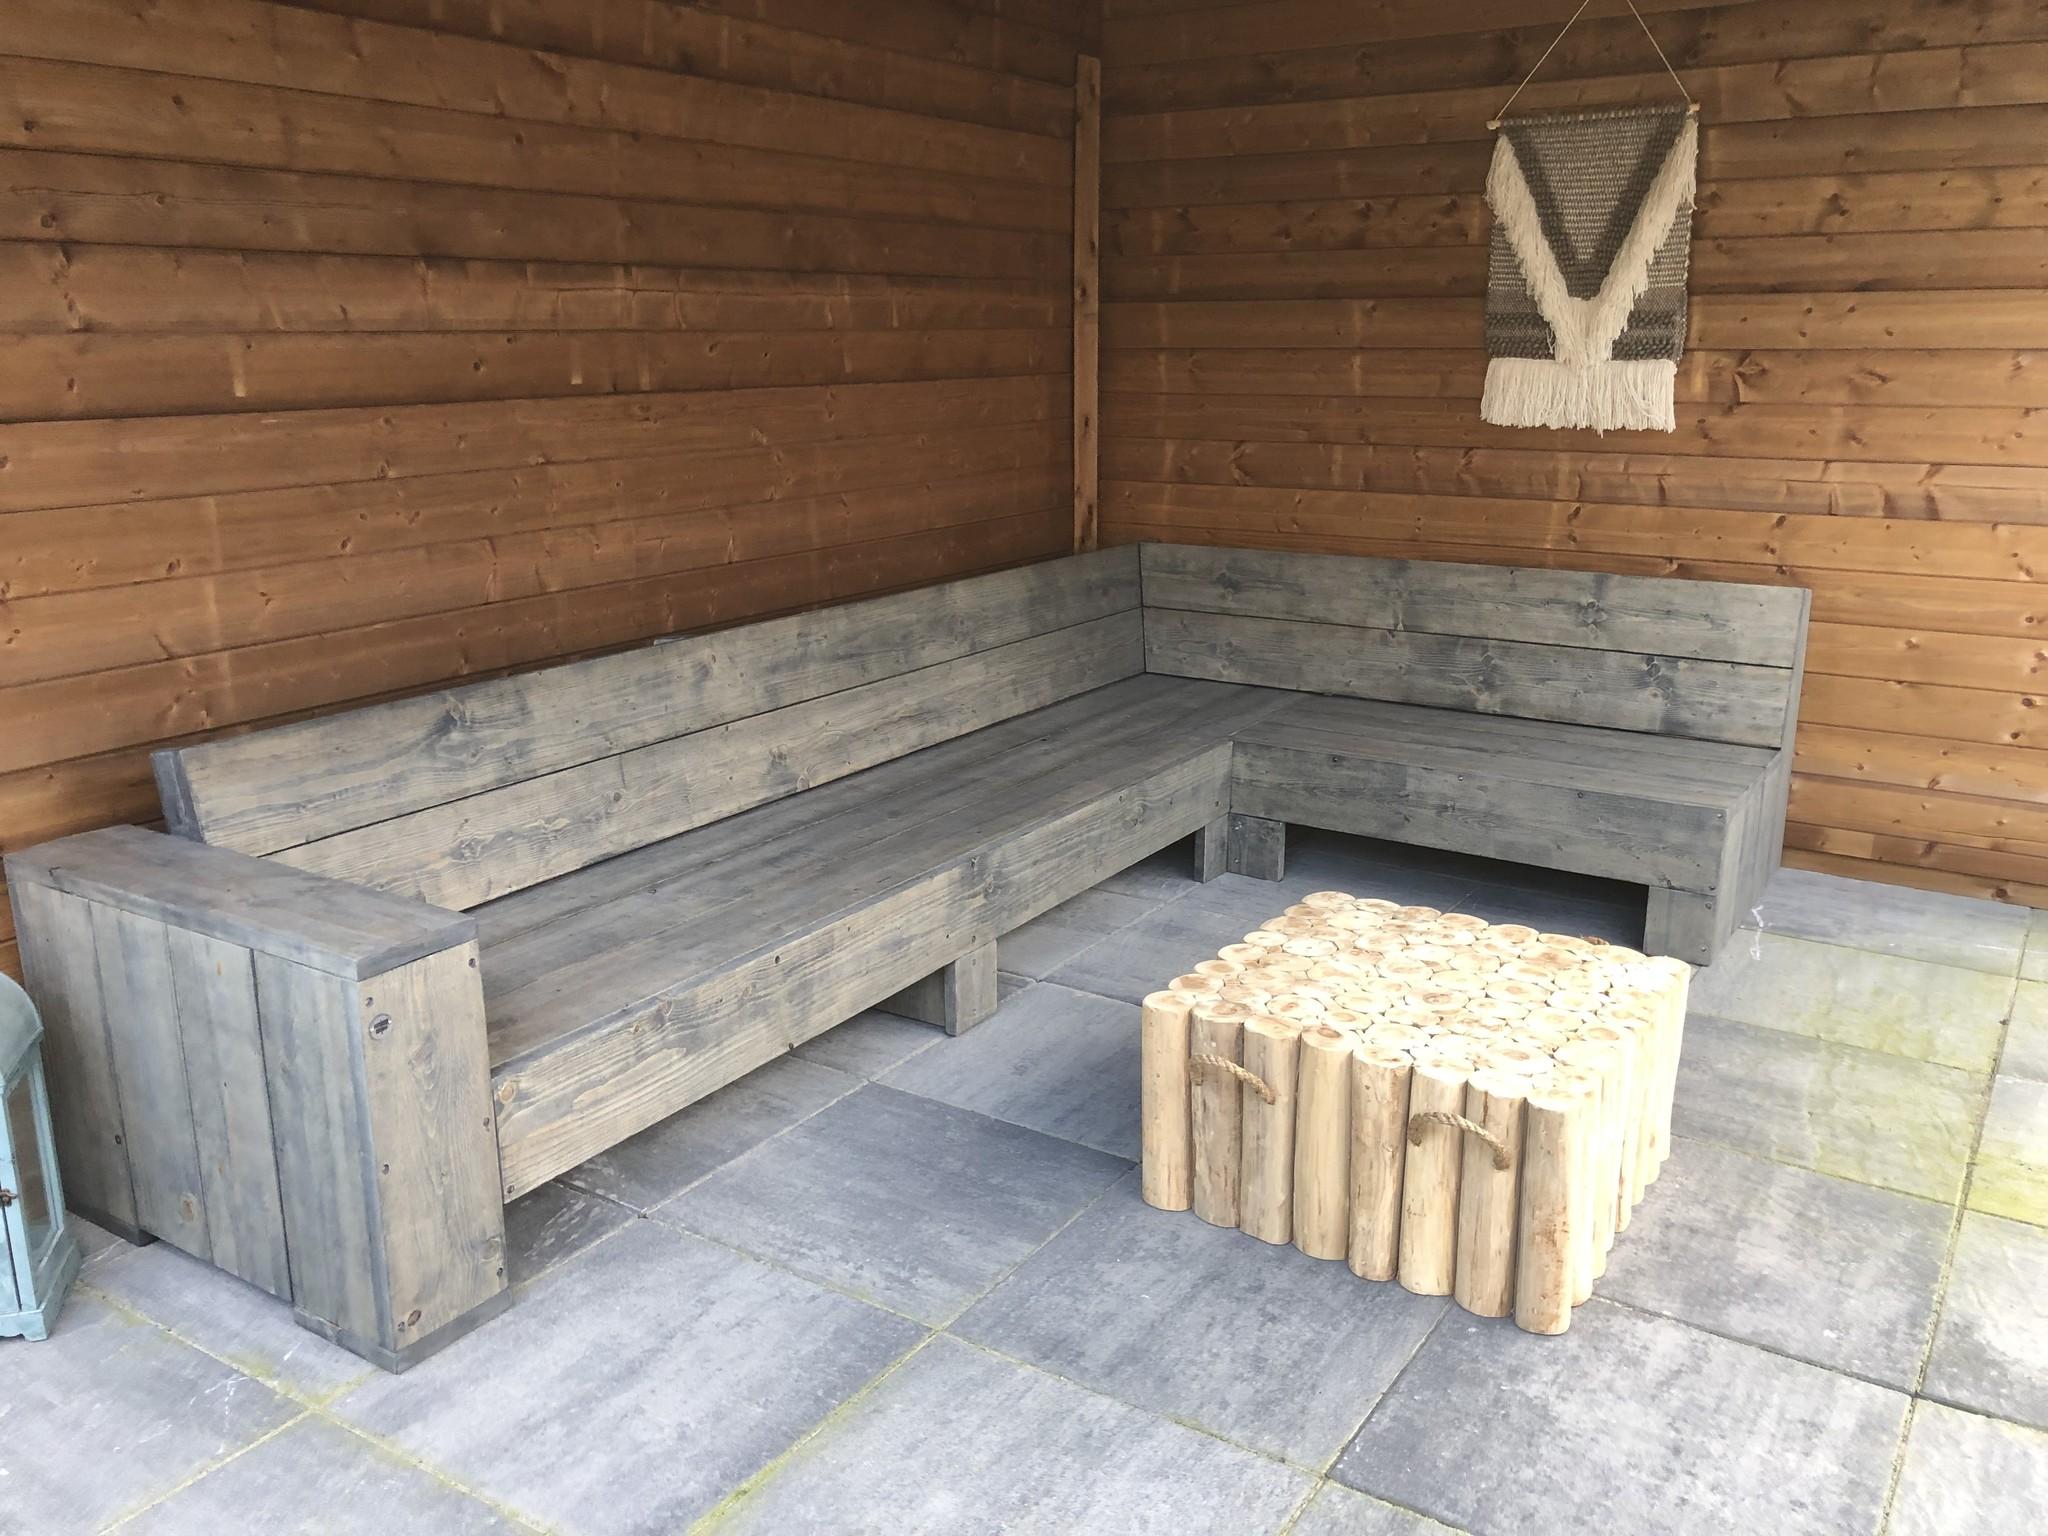 Robert Hoekbank van steigerhout